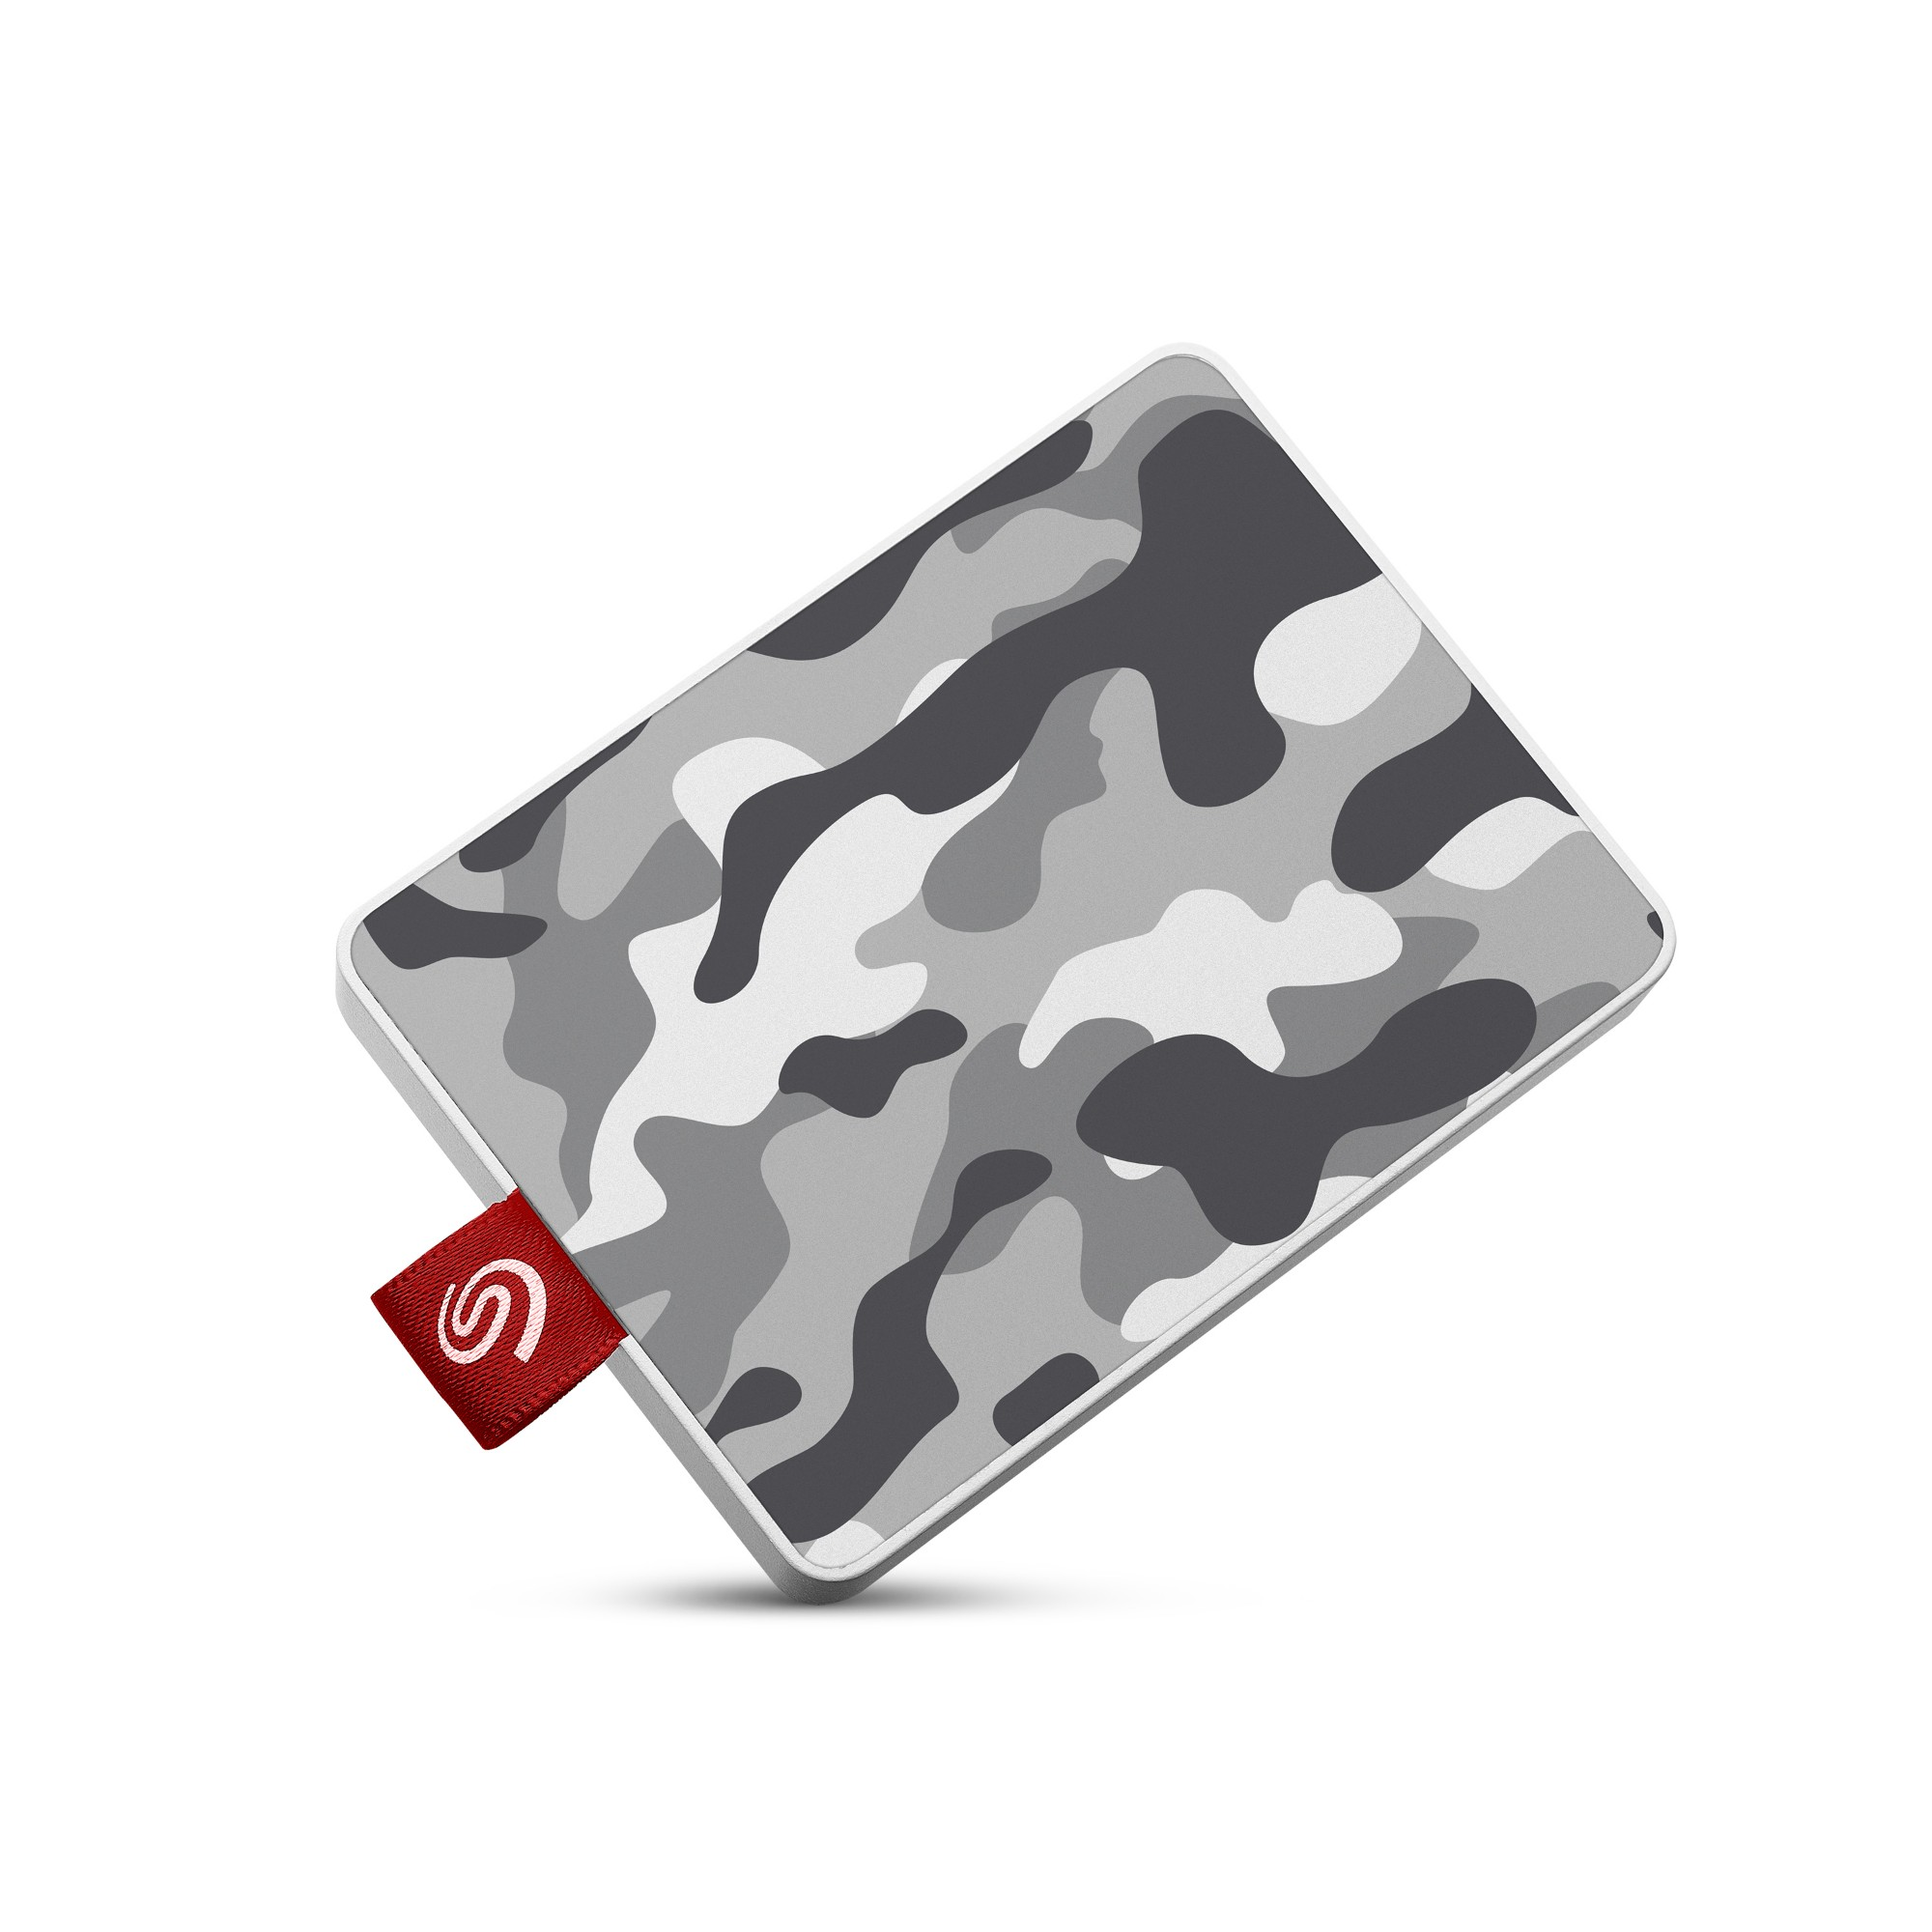 Seagate STJE500404 external hard drive 500 GB Camouflage,Grey